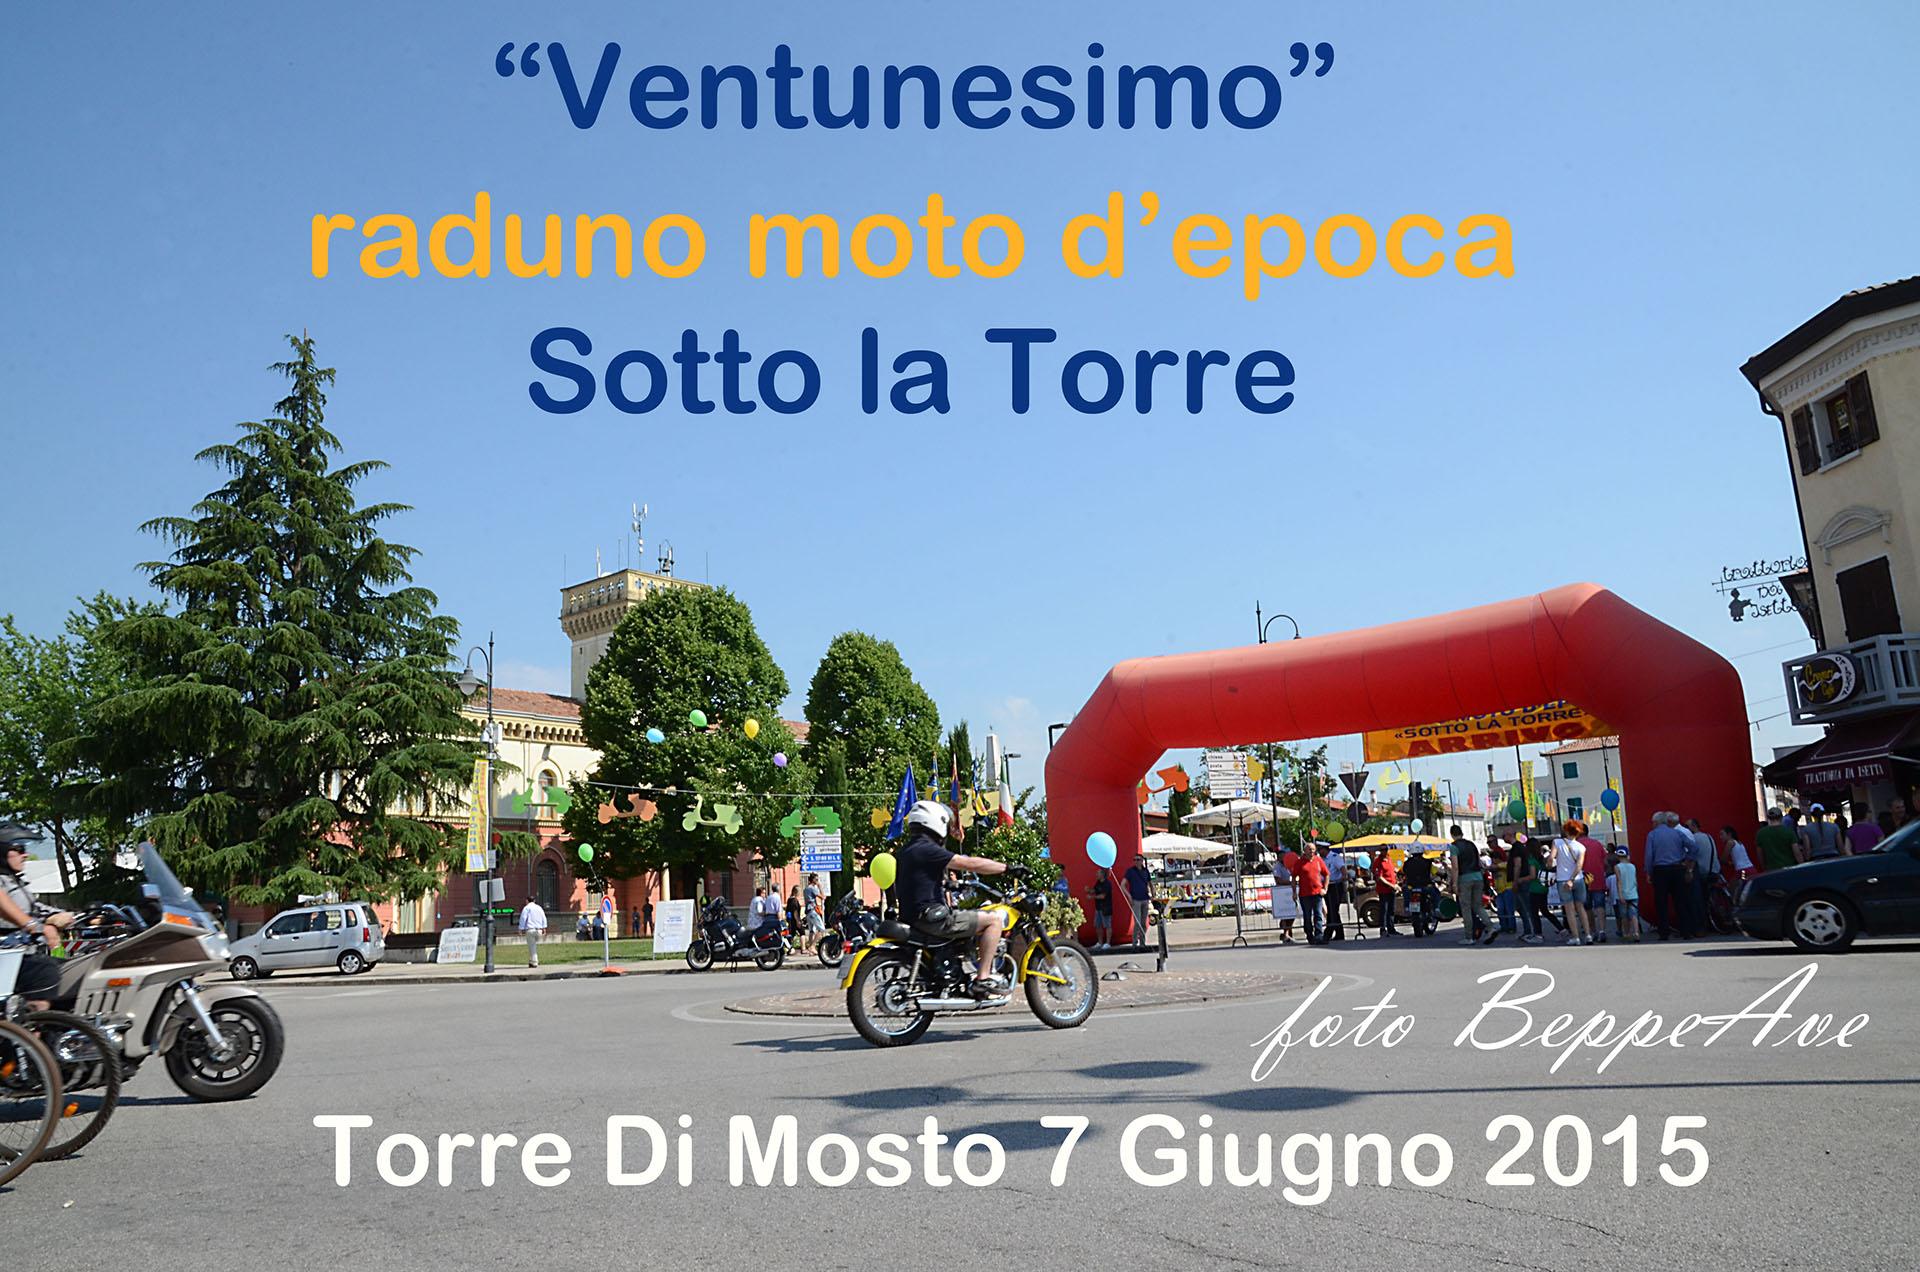 "21° Raduno Moto d'epoca ""Sotto la Torre"". 7 Giugno 2015"